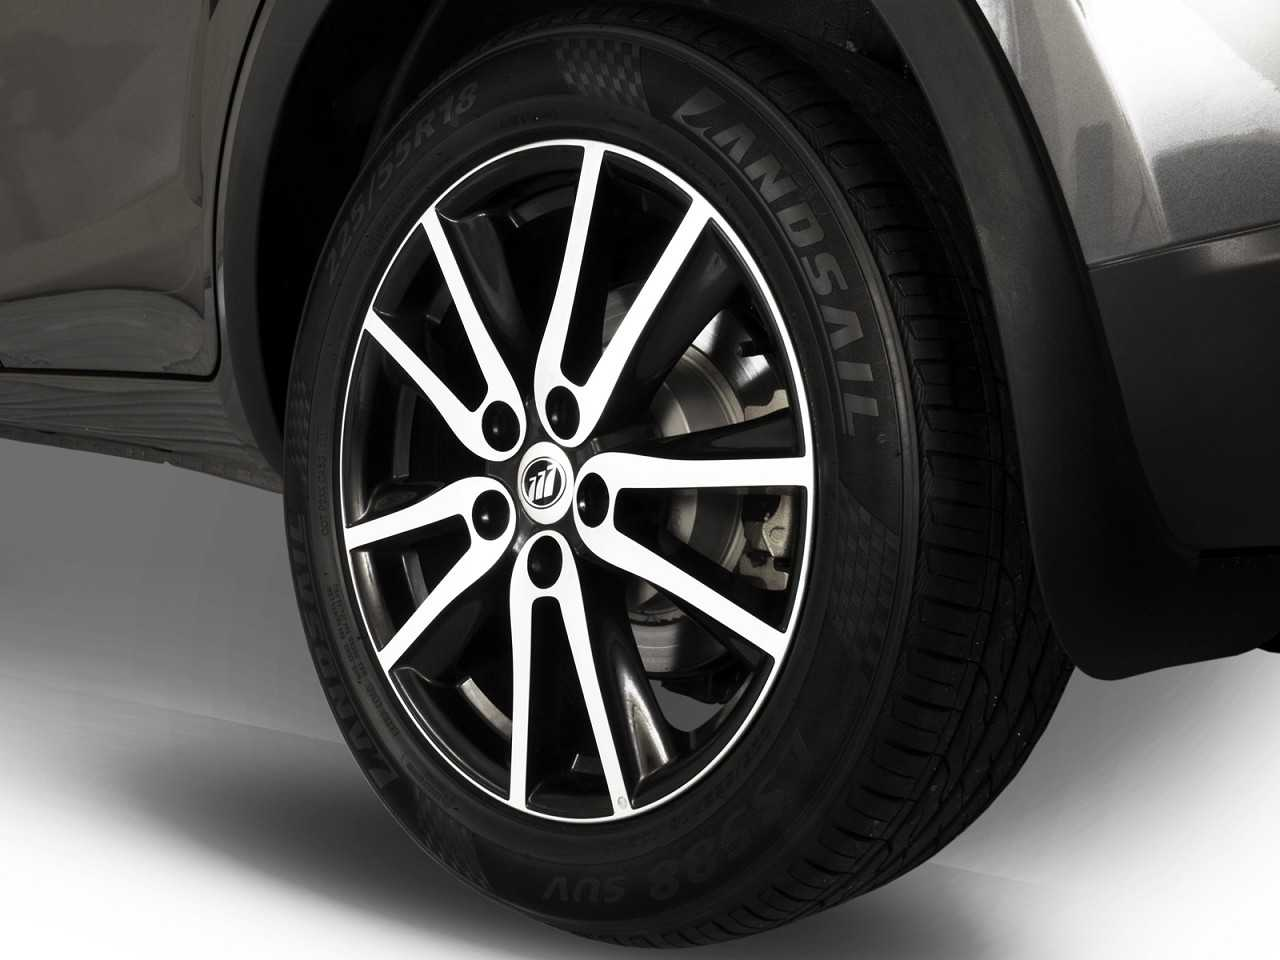 LifanX60 2018 - rodas